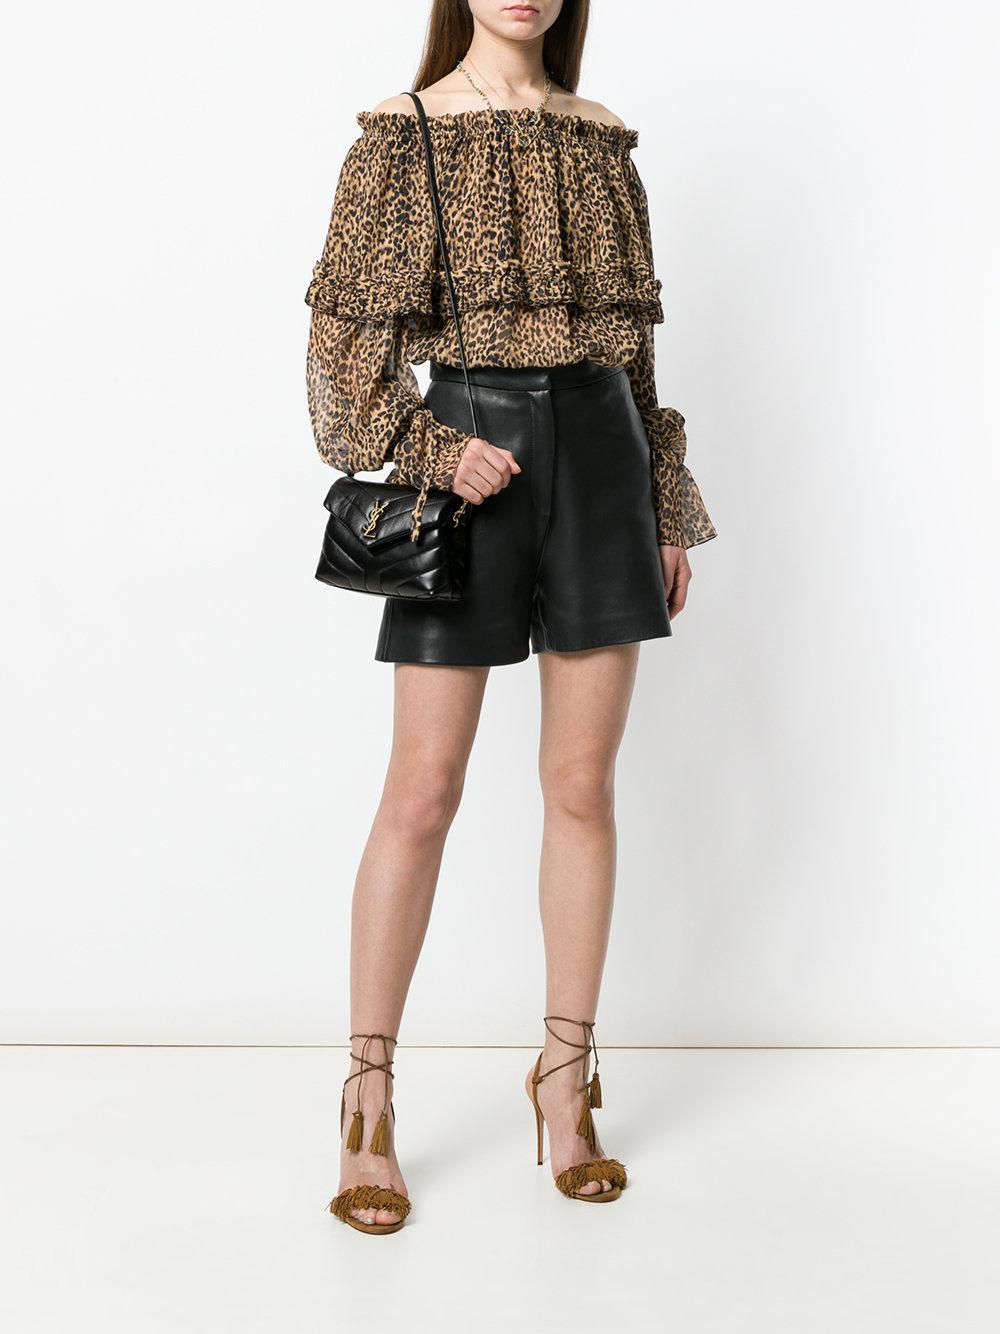 Lyst - Saint Laurent Toy Loulou Shoulder Bag in Black - Save 12% 3f4343c3974fc